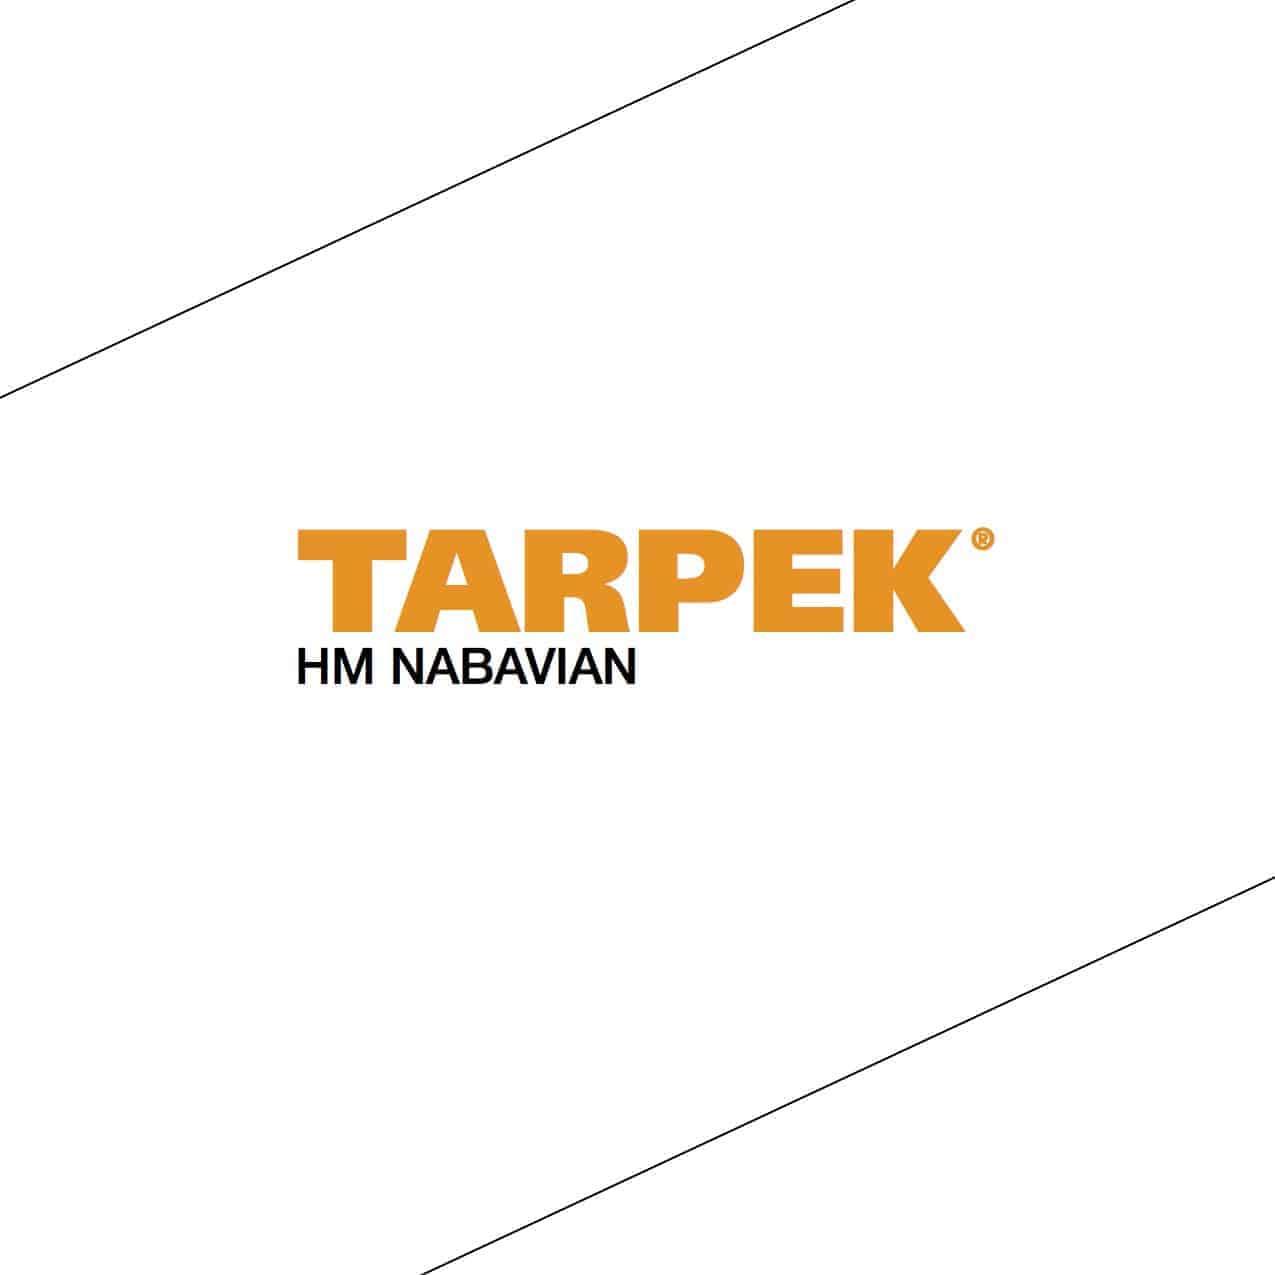 TARPEK™